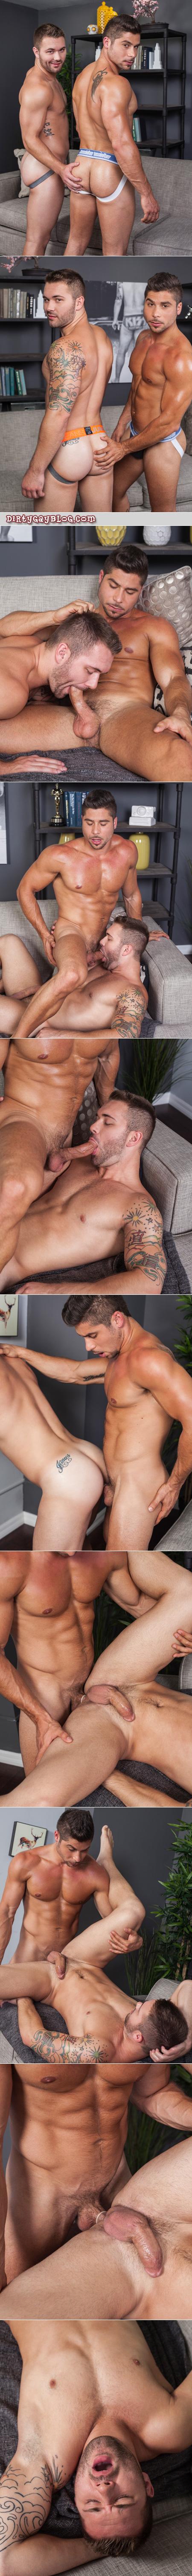 Straight Italian muscle hunk fucking a stocky muscular bottom.